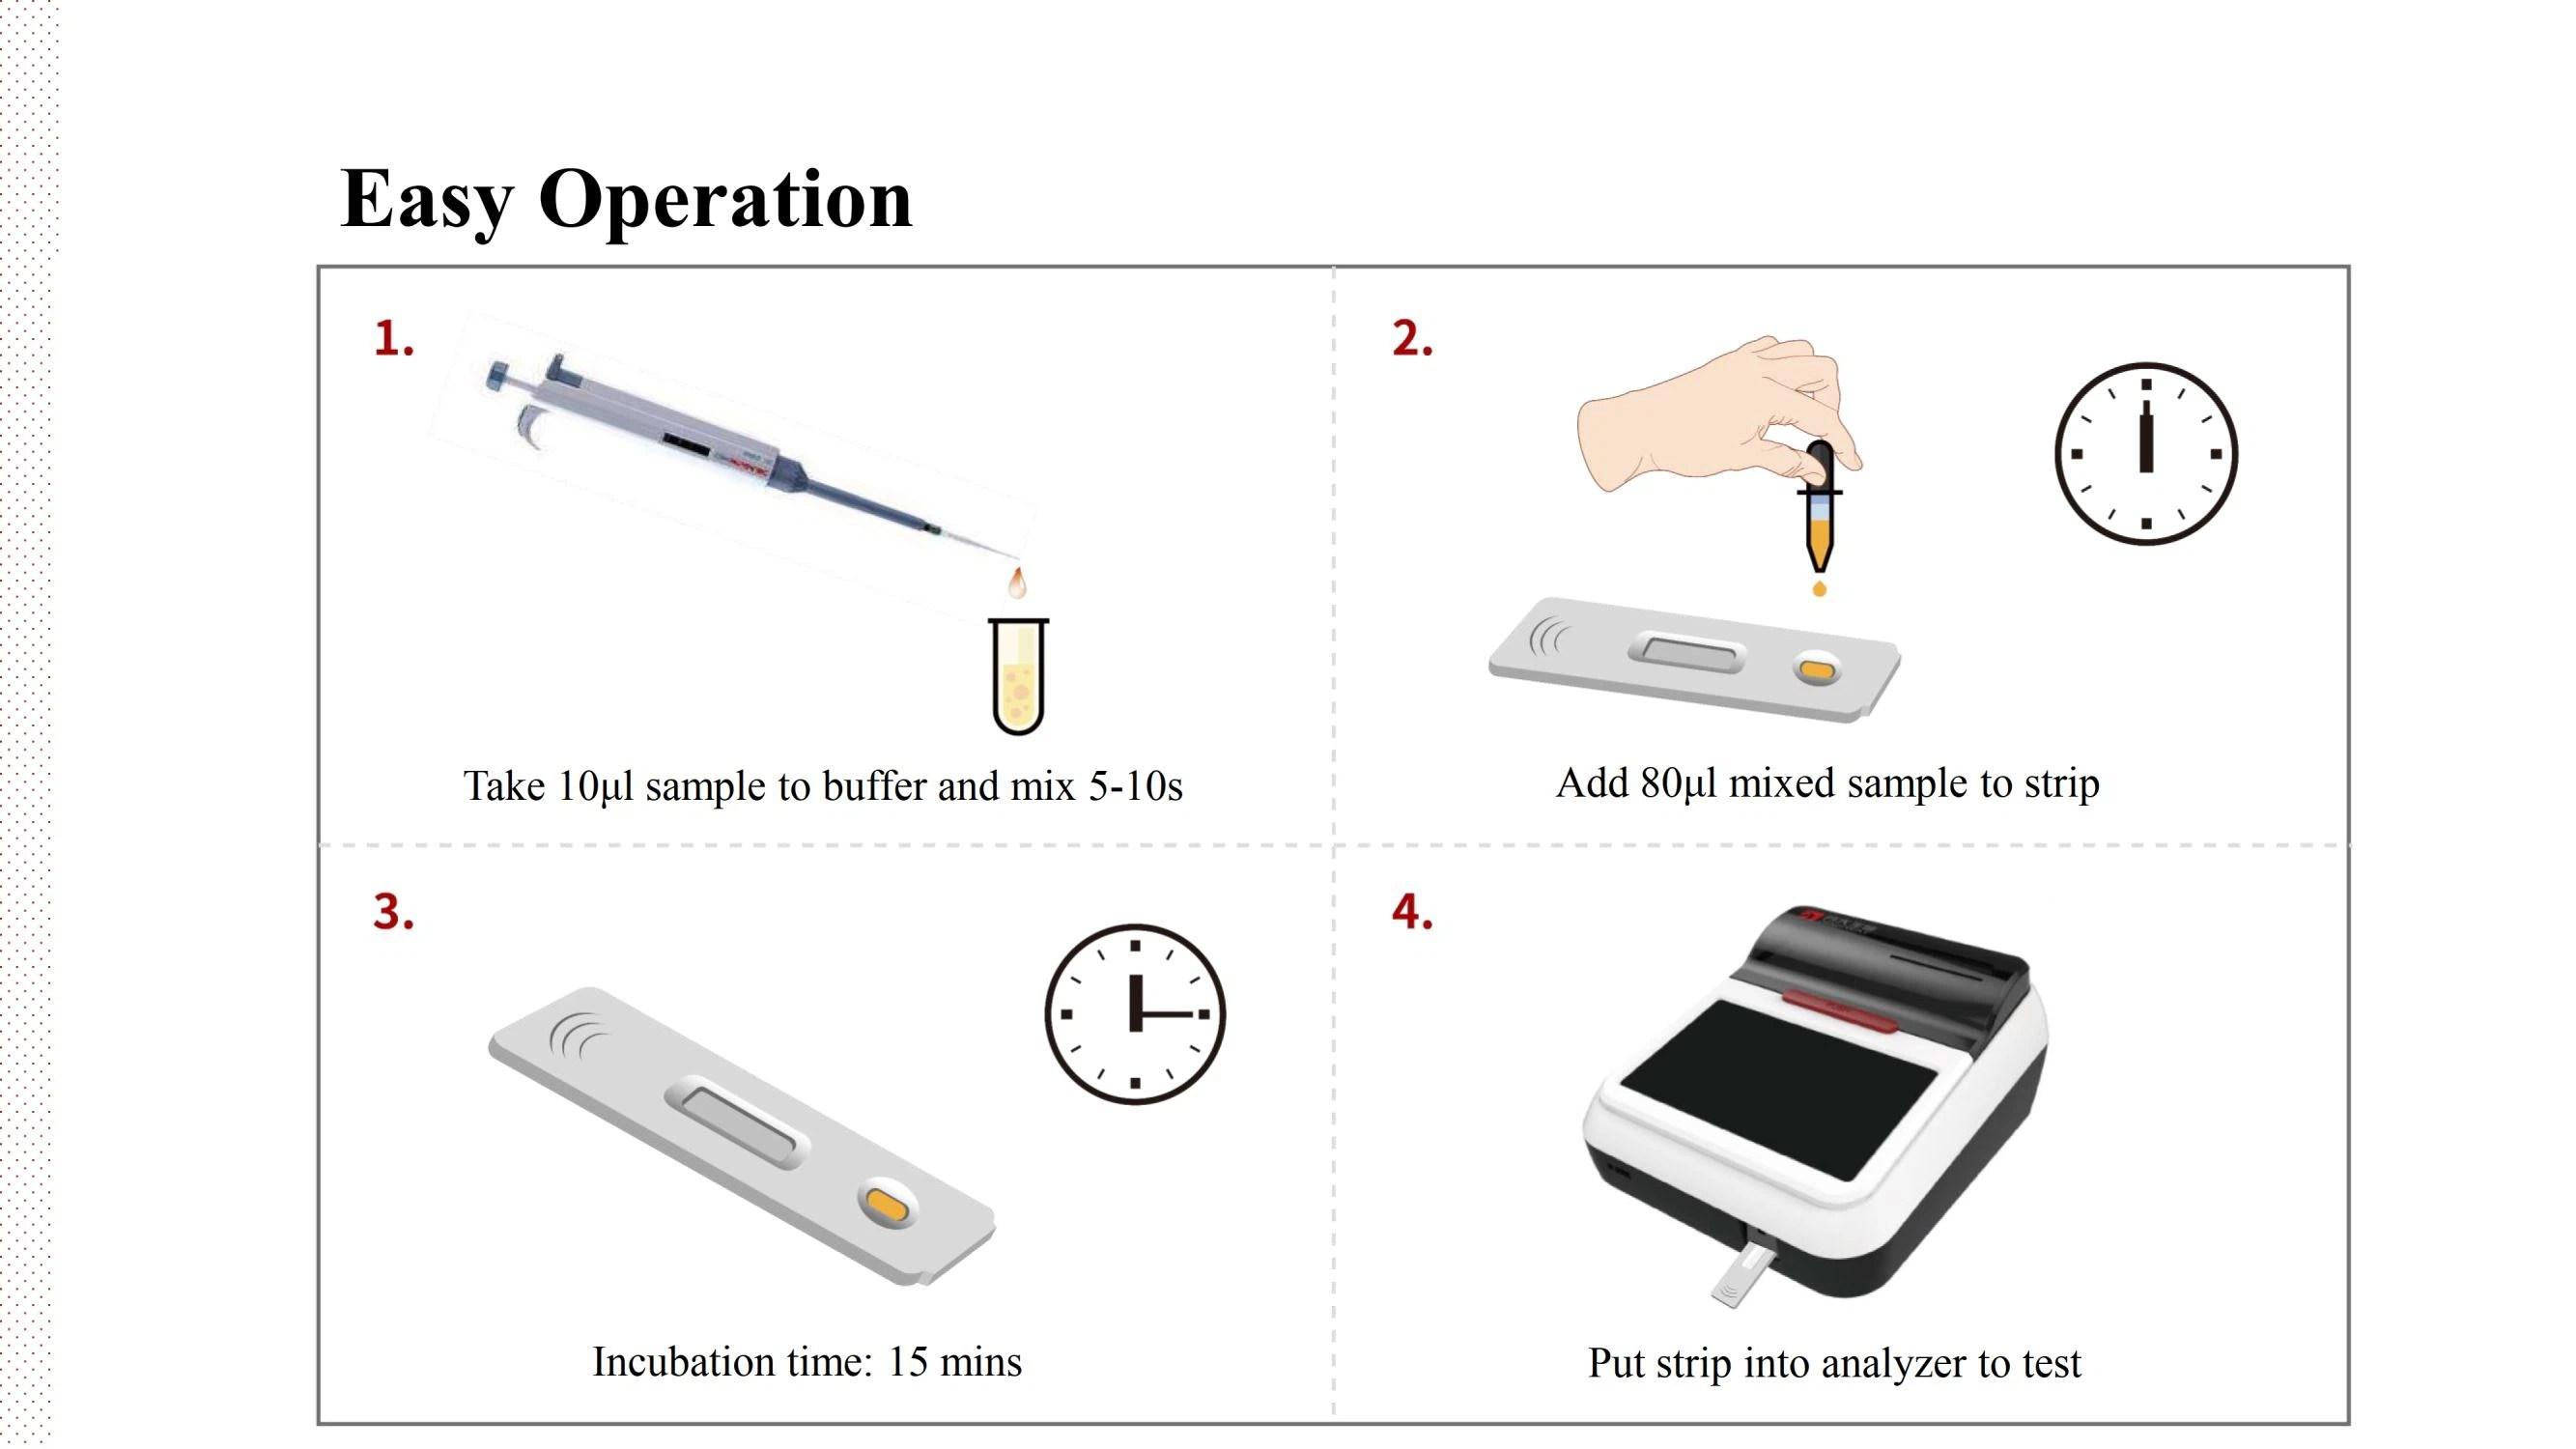 2019-Ncov Igg/Igm Antibody Rapid Test Kit Covid-19